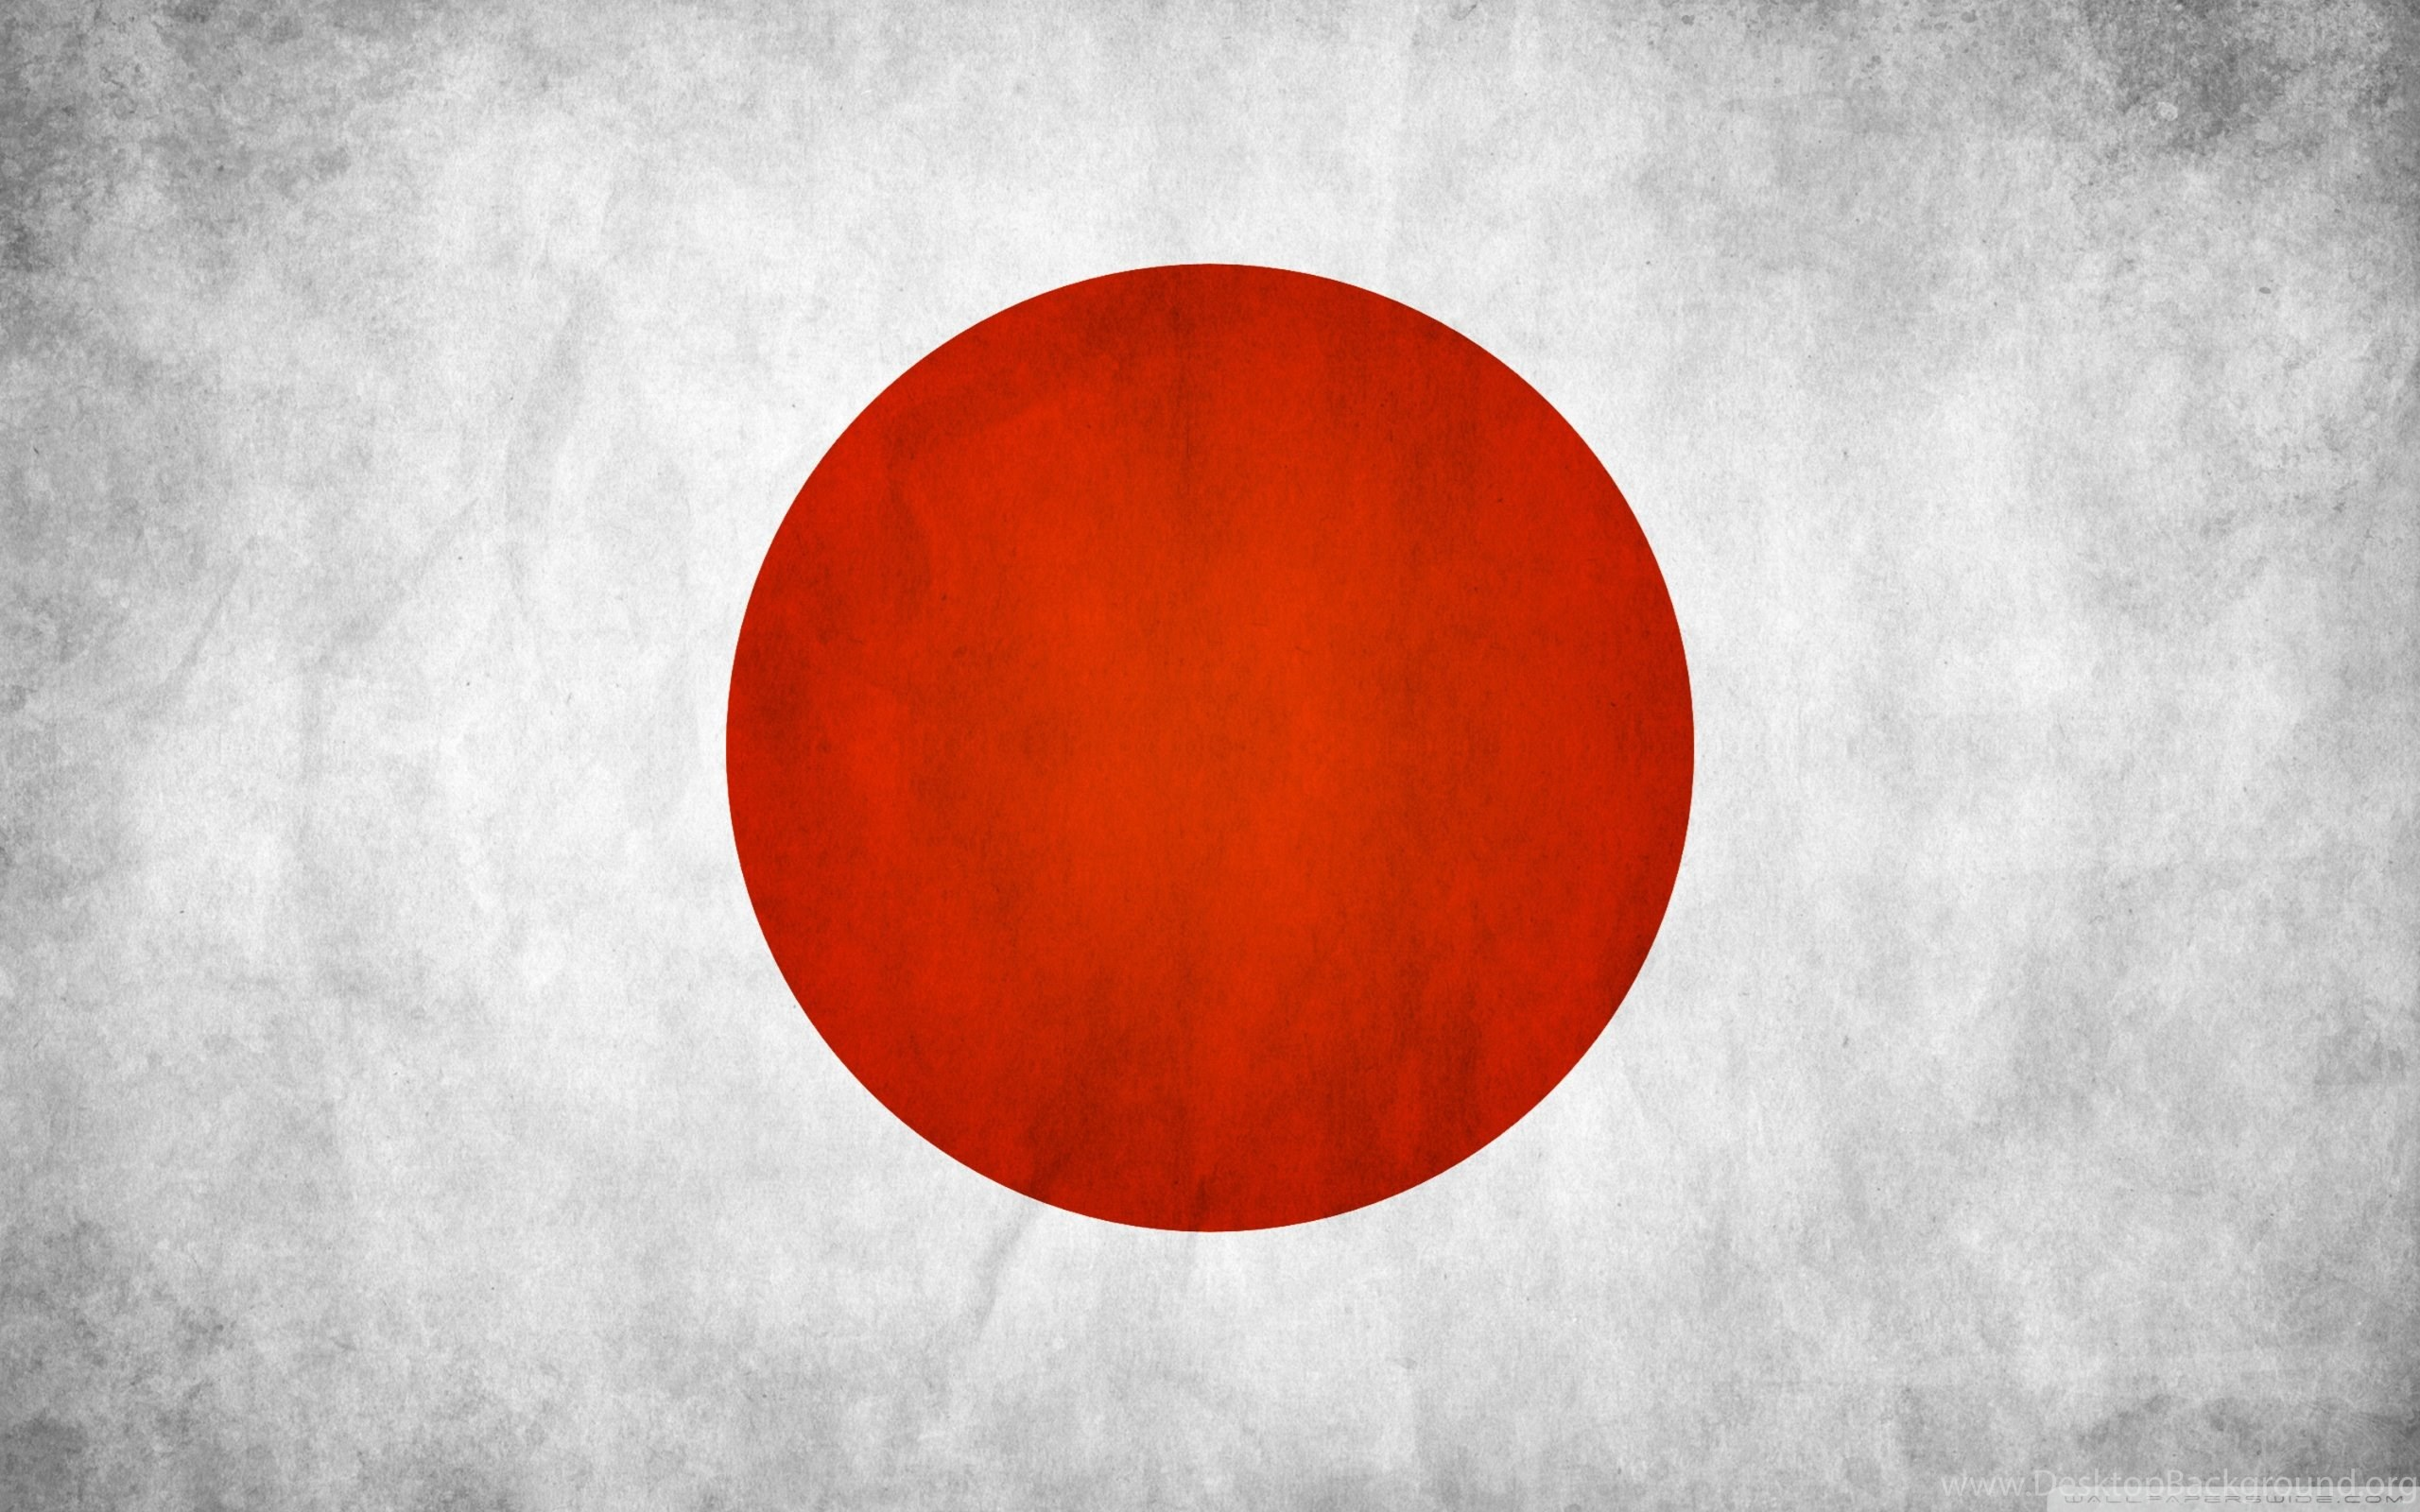 Japanese flag wallpaper size 2560x1600 desktop background original size 6222kb voltagebd Gallery